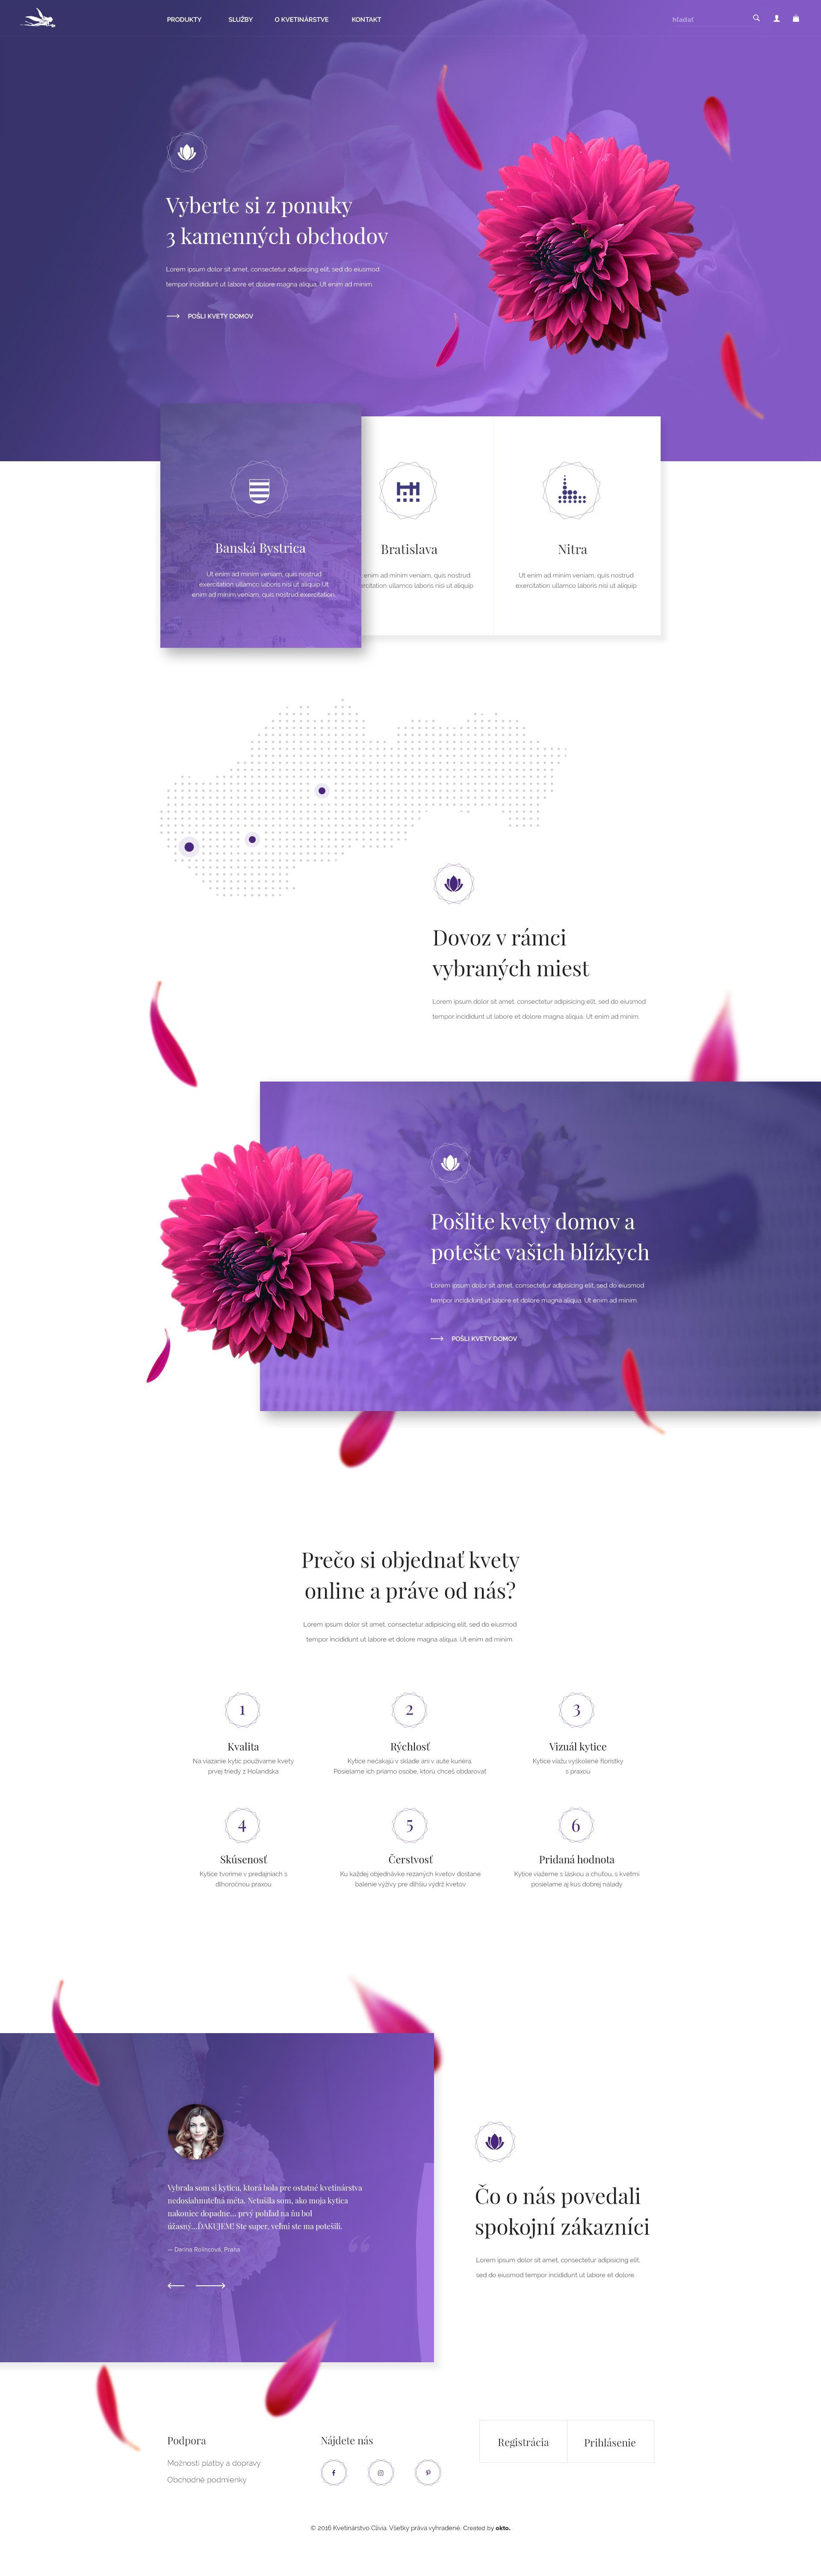 https://yburis.com #yburis #landingpage #website #singlepage #web #love #awesomedesign #purple #mobile #app #webpage #webdesign #webdevelopment #love #travel